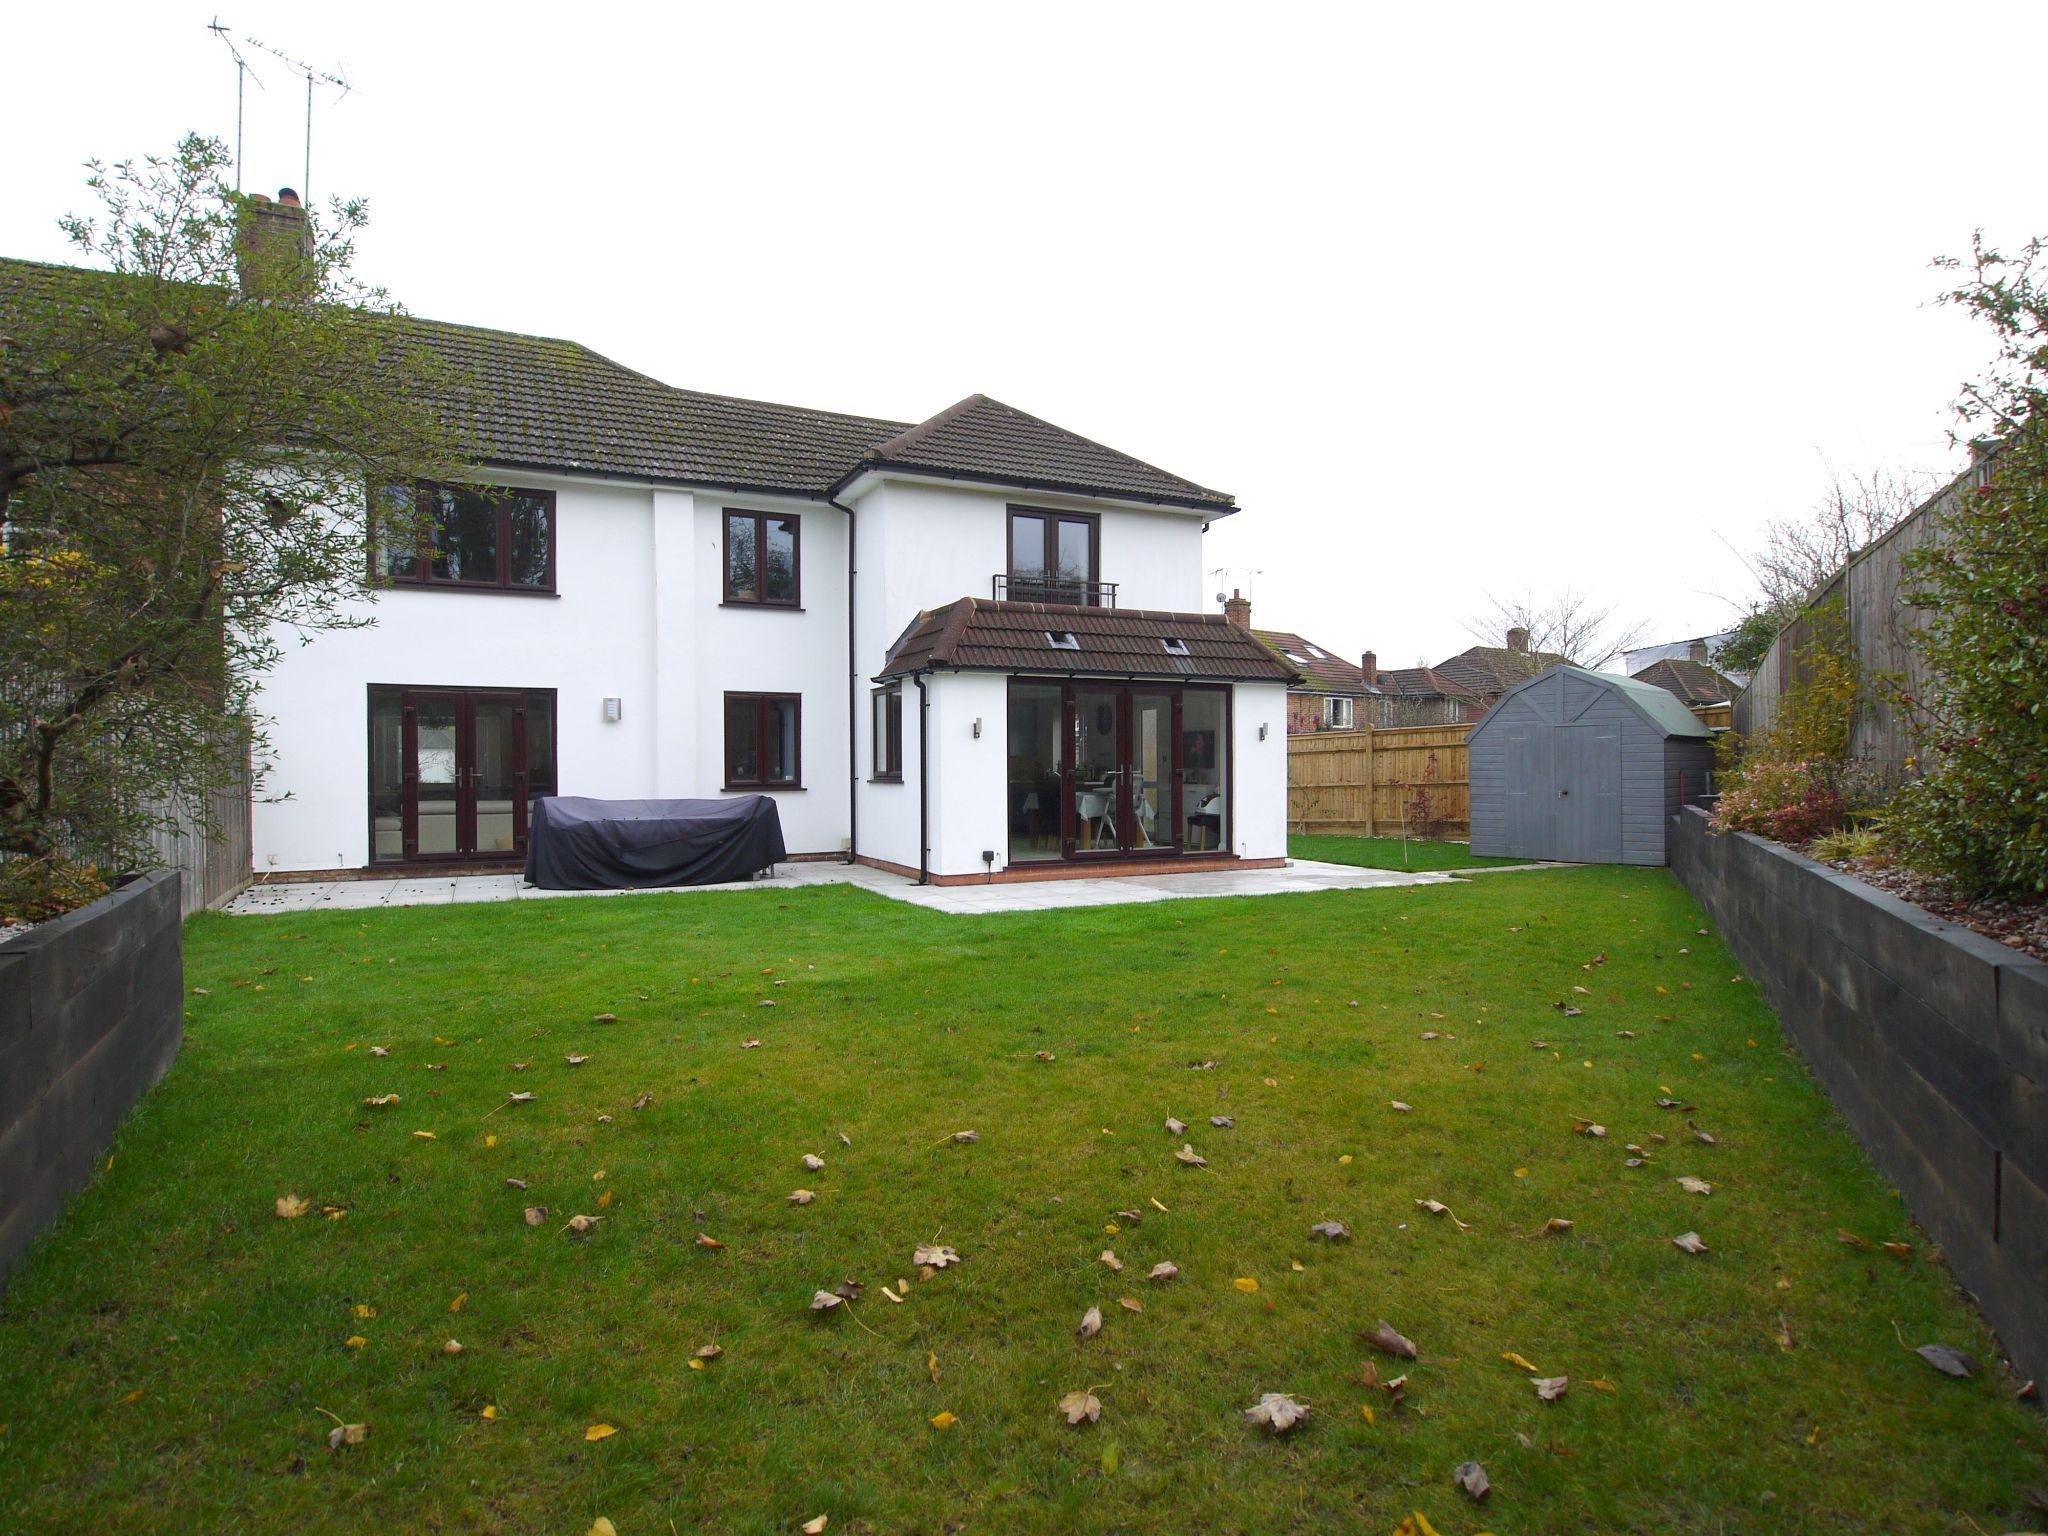 4 bedroom semi-detached house For Sale in Sevenoaks - Photograph 1